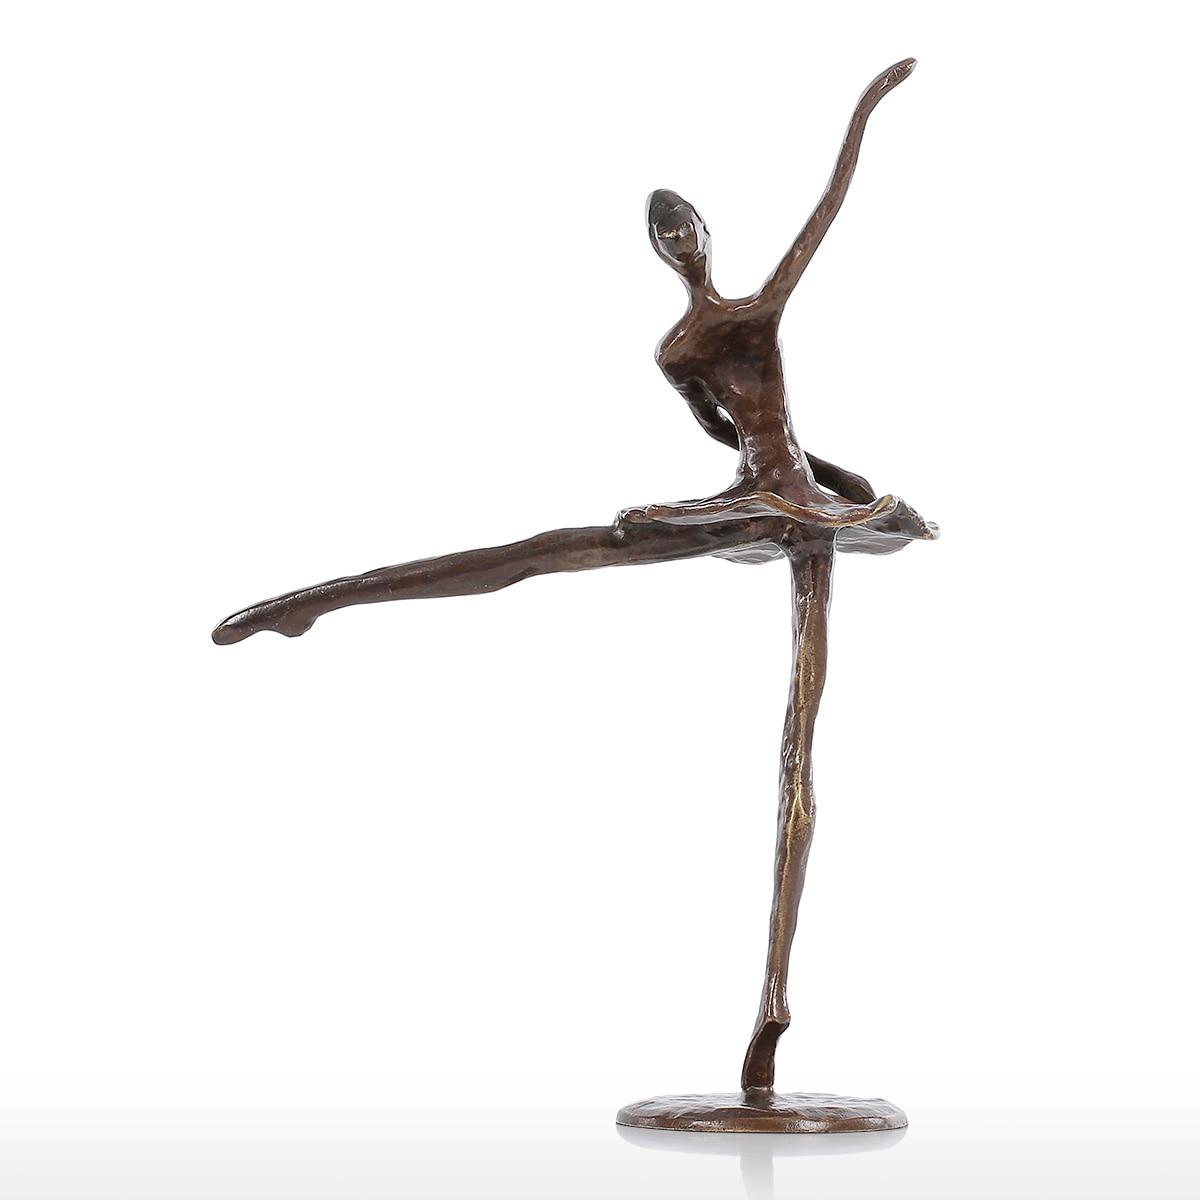 Tooarts Statuette Ballet Modern Dance Bronze Statue Metal